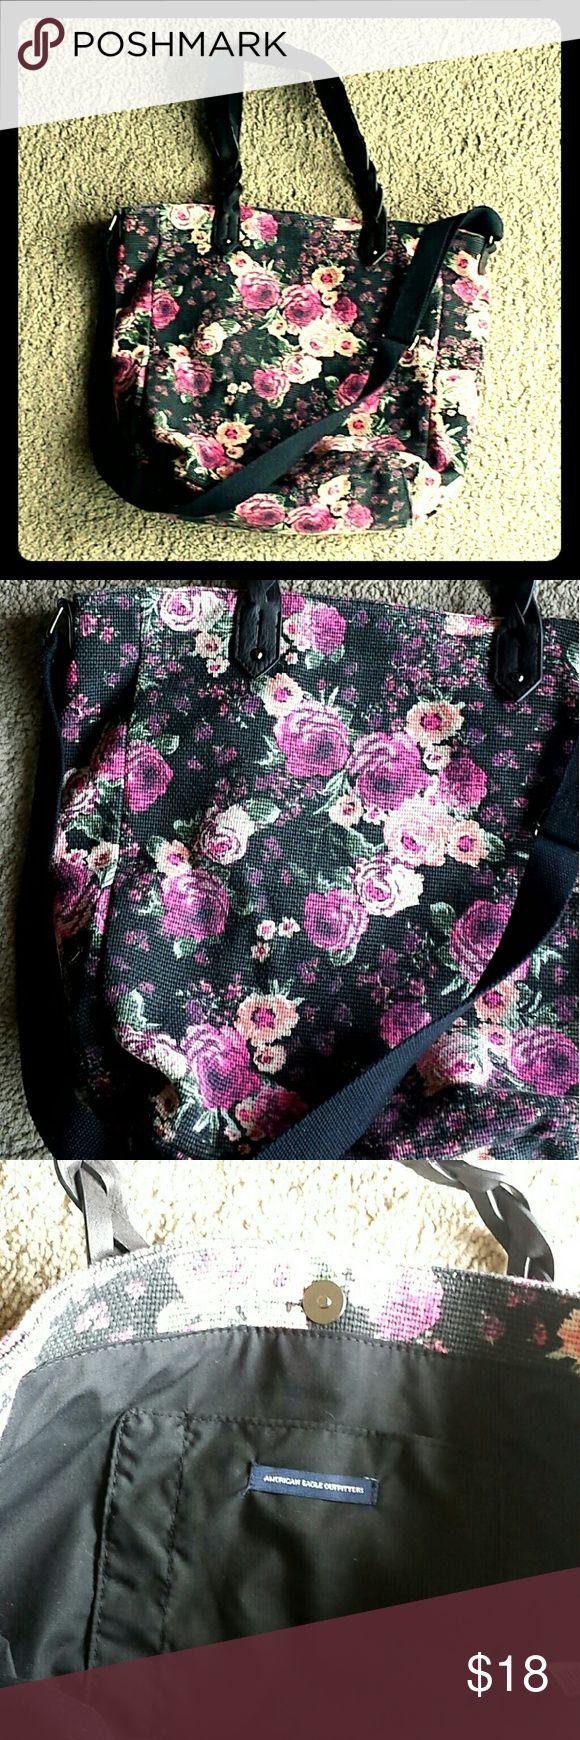 American Eagle tote bag American Eagle medium rose tote bag. Gently used. American Eagle Outfitters Bags Totes